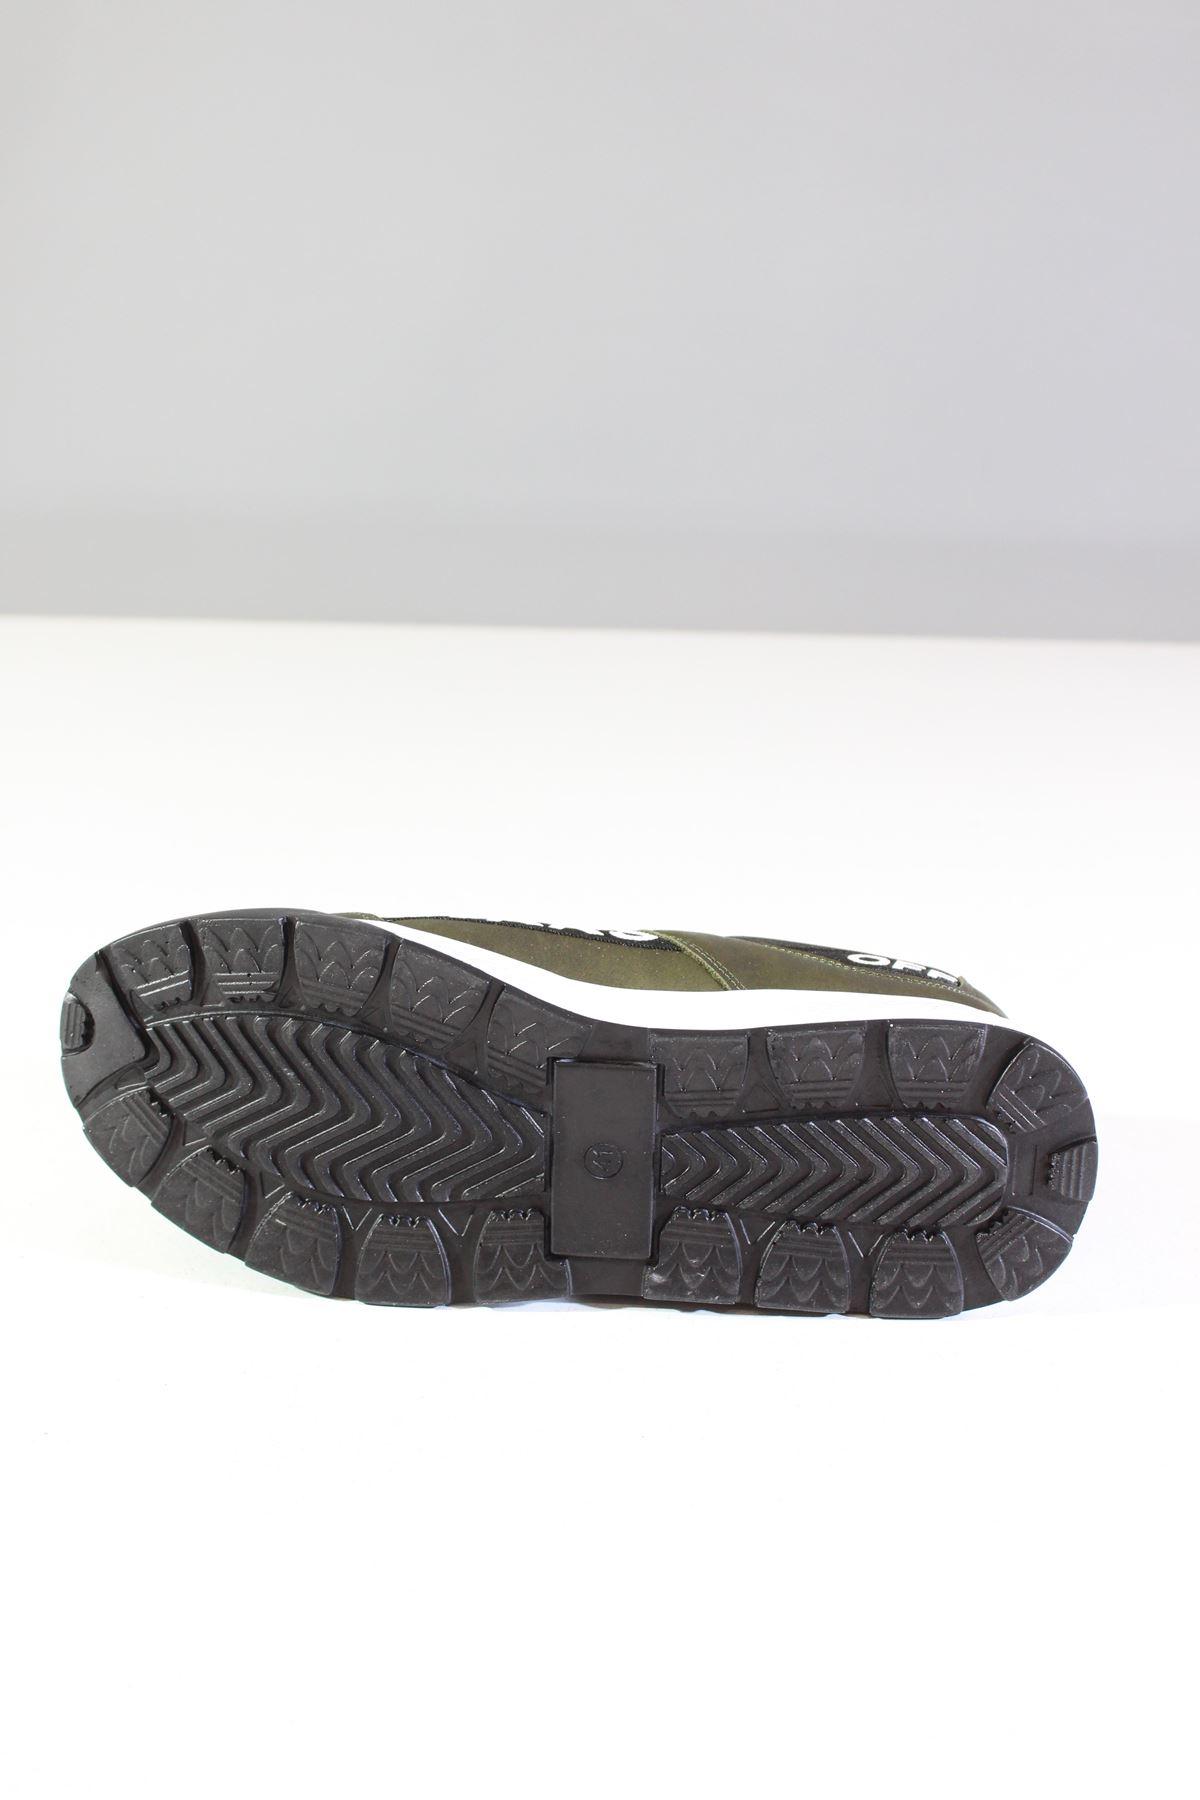 Wickers 2300 Haki-Siyah Nubuk Erkek Spor Ayakkabı